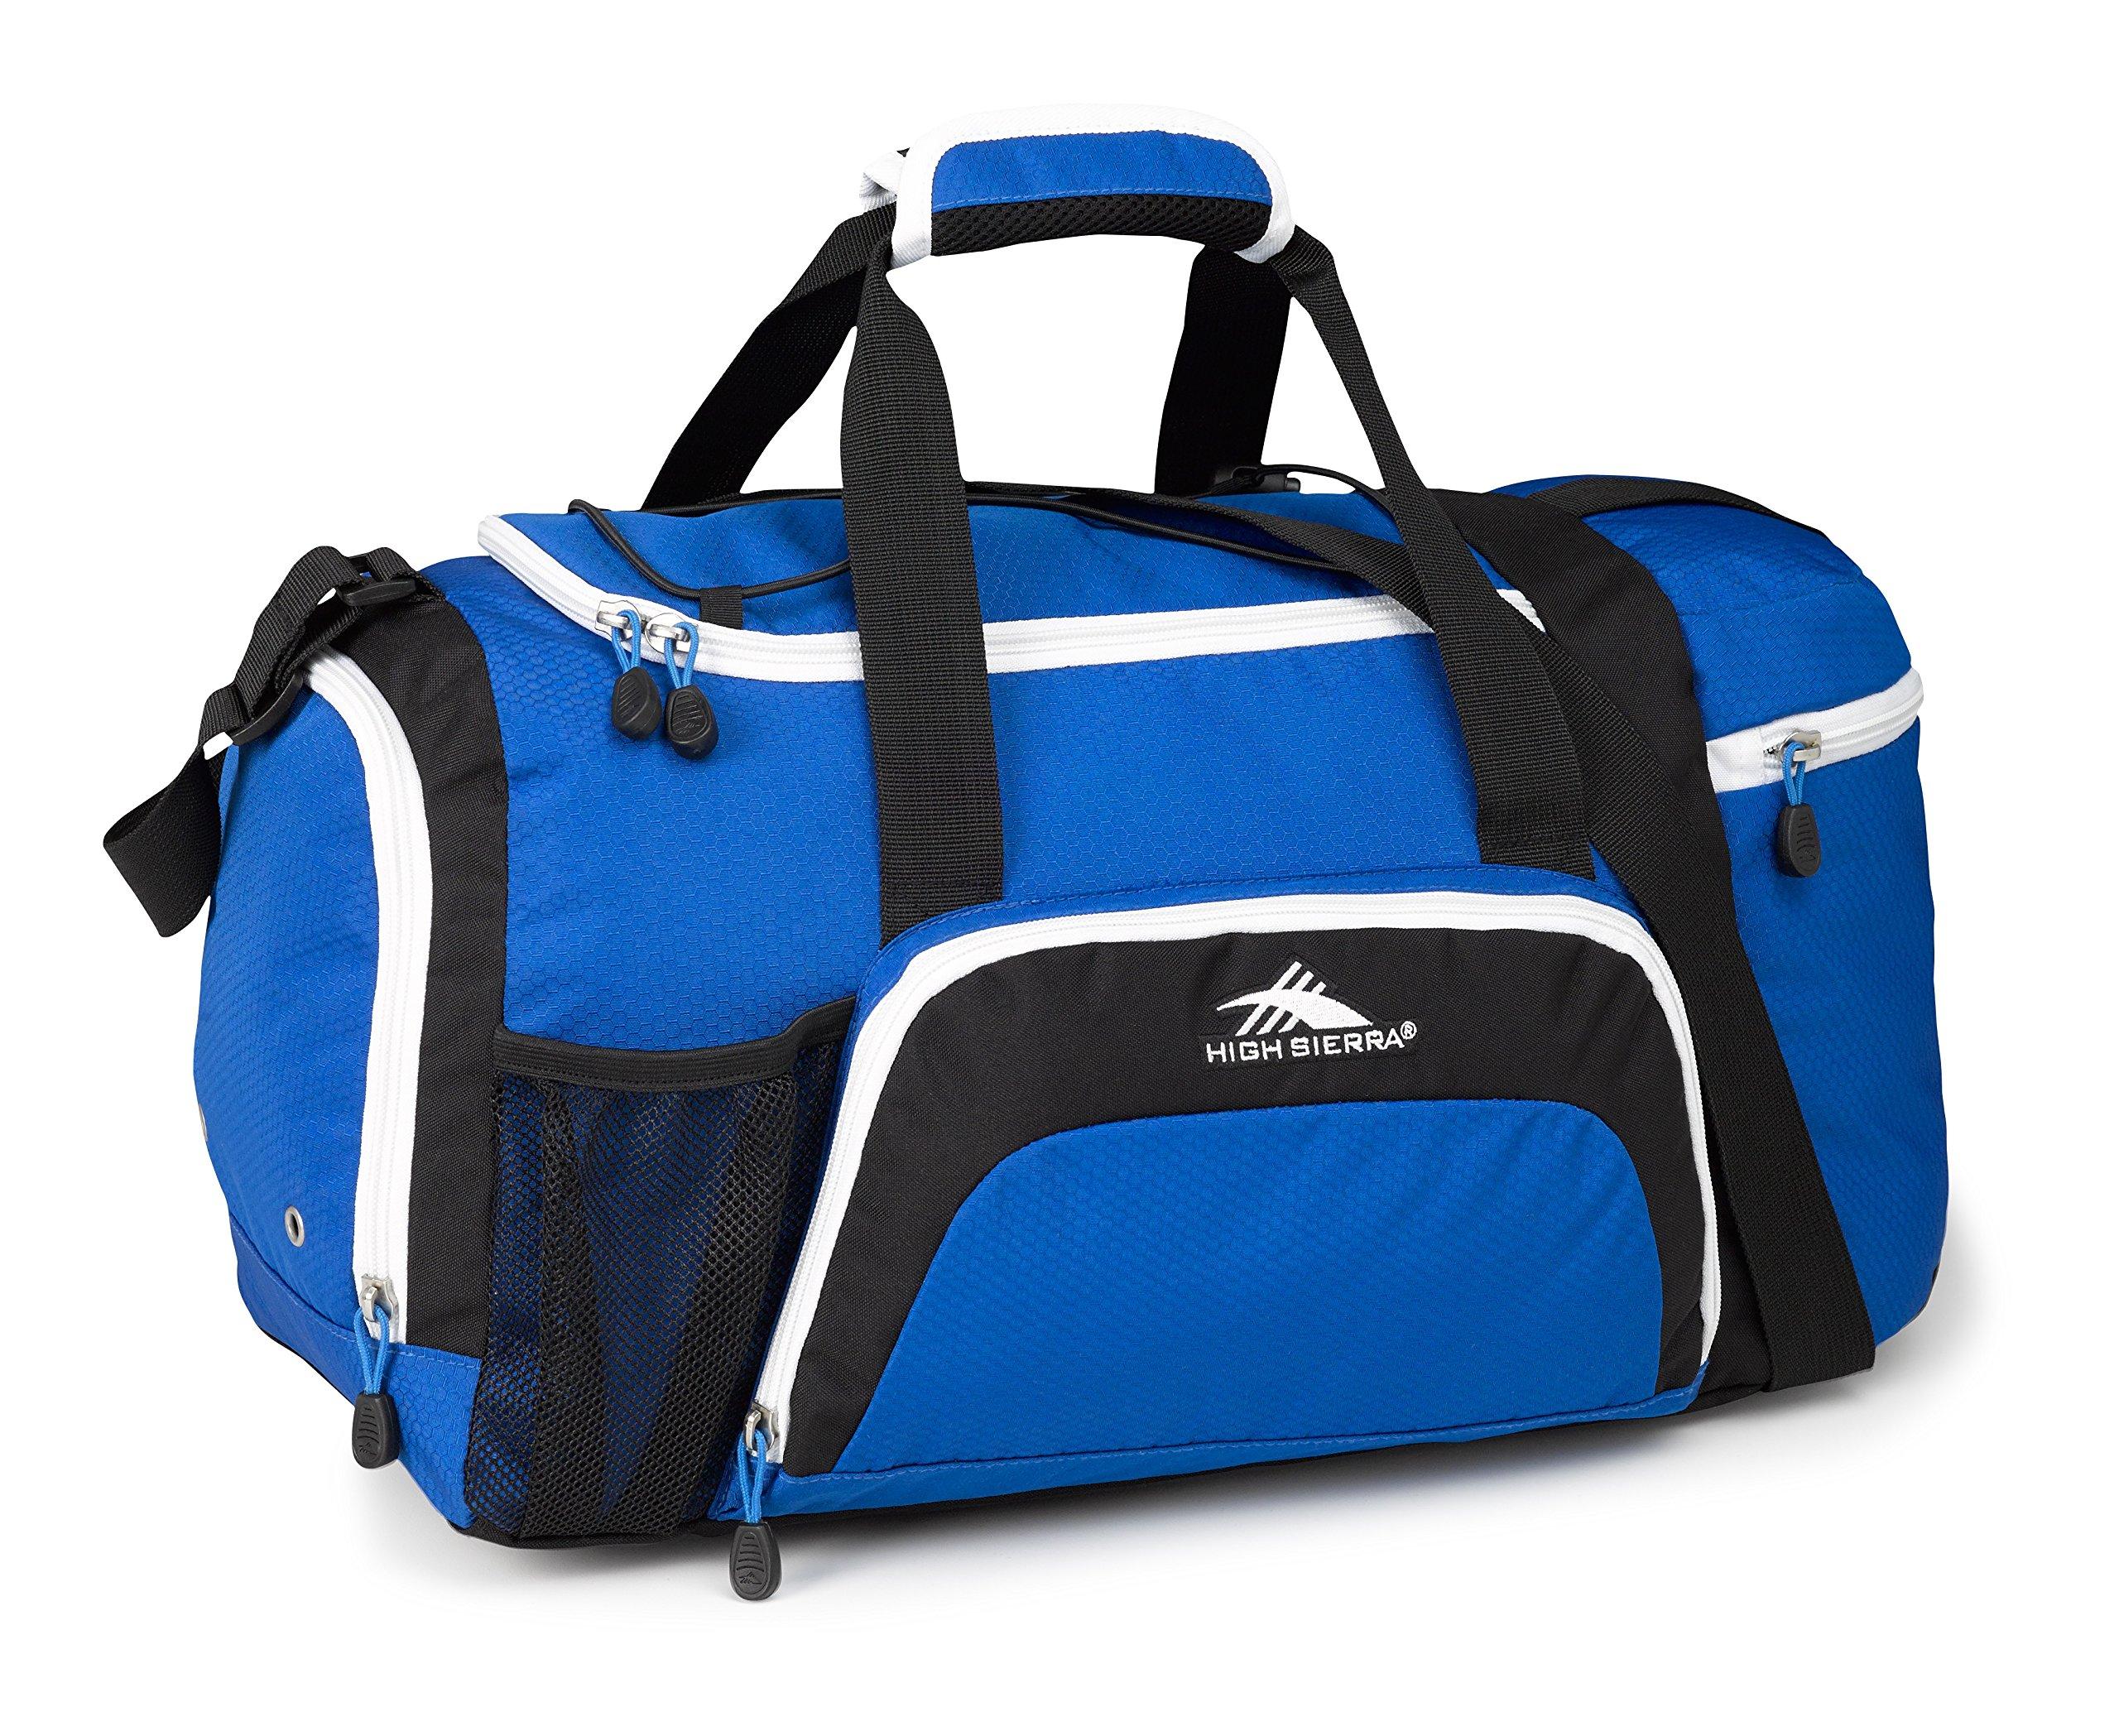 High Sierra Crossport 2 Ringleader Duffel Bag, Vivid Blue/Black/White